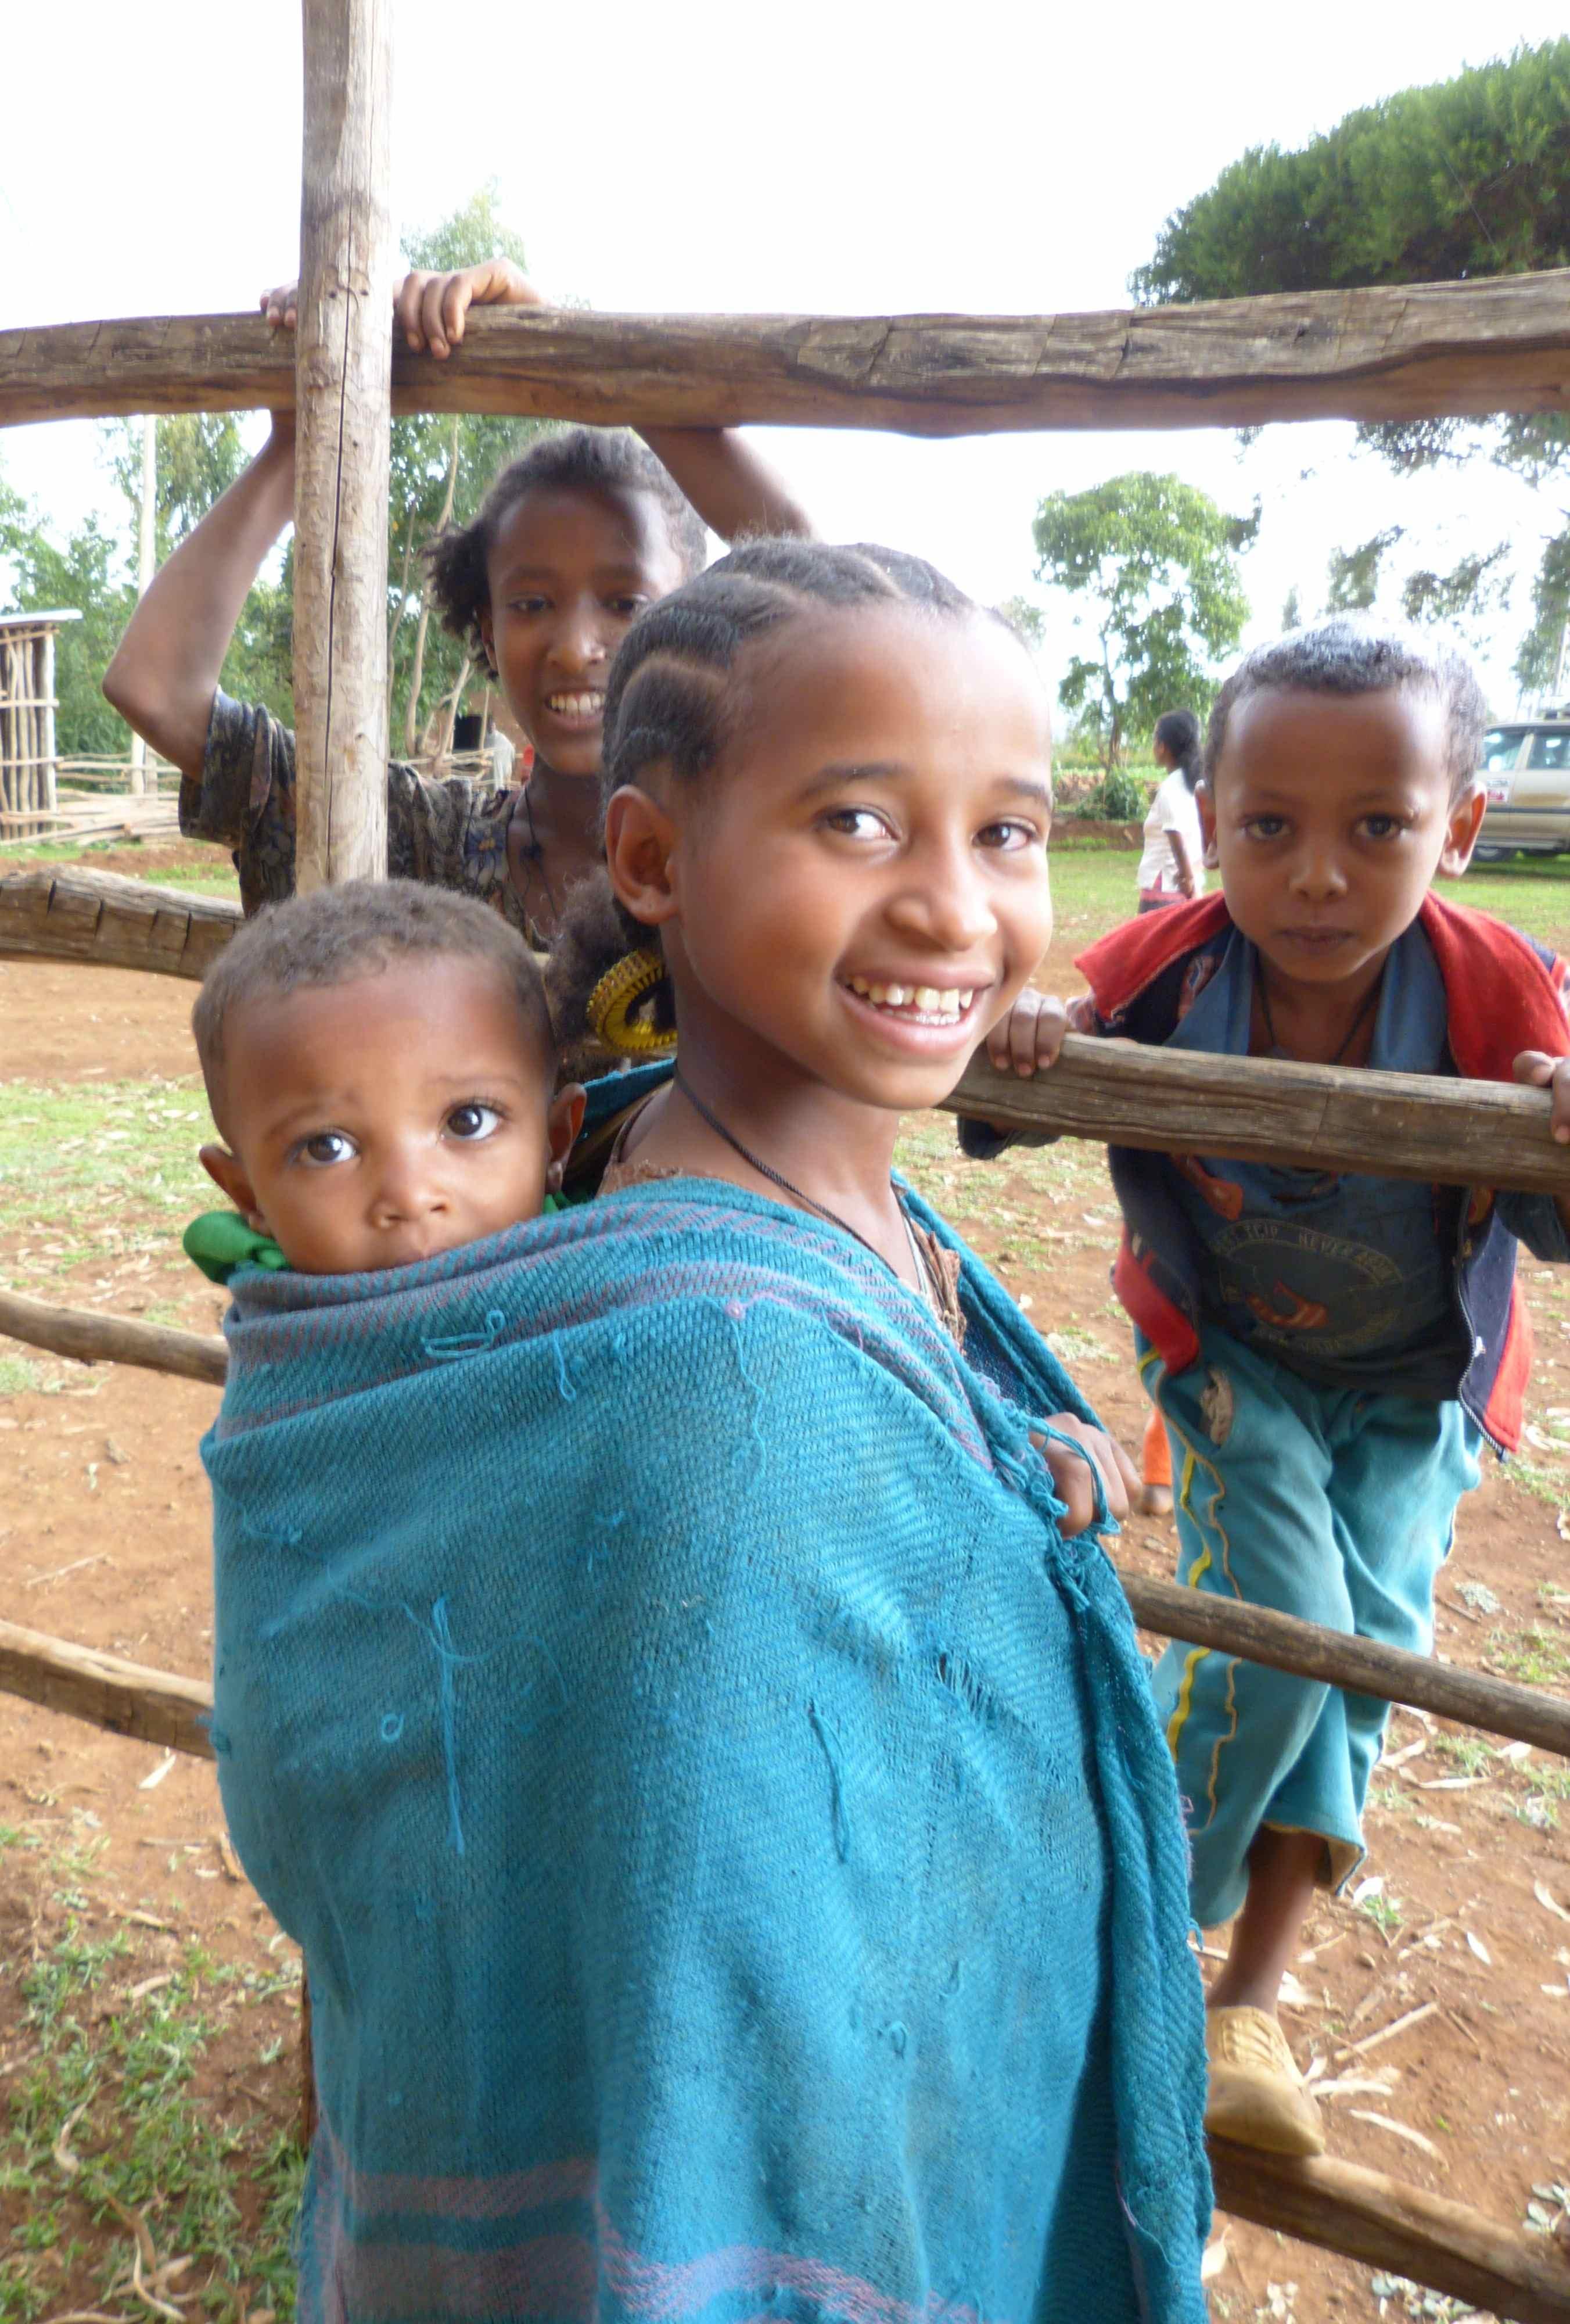 Children at Mosebo Village, Ethiopia